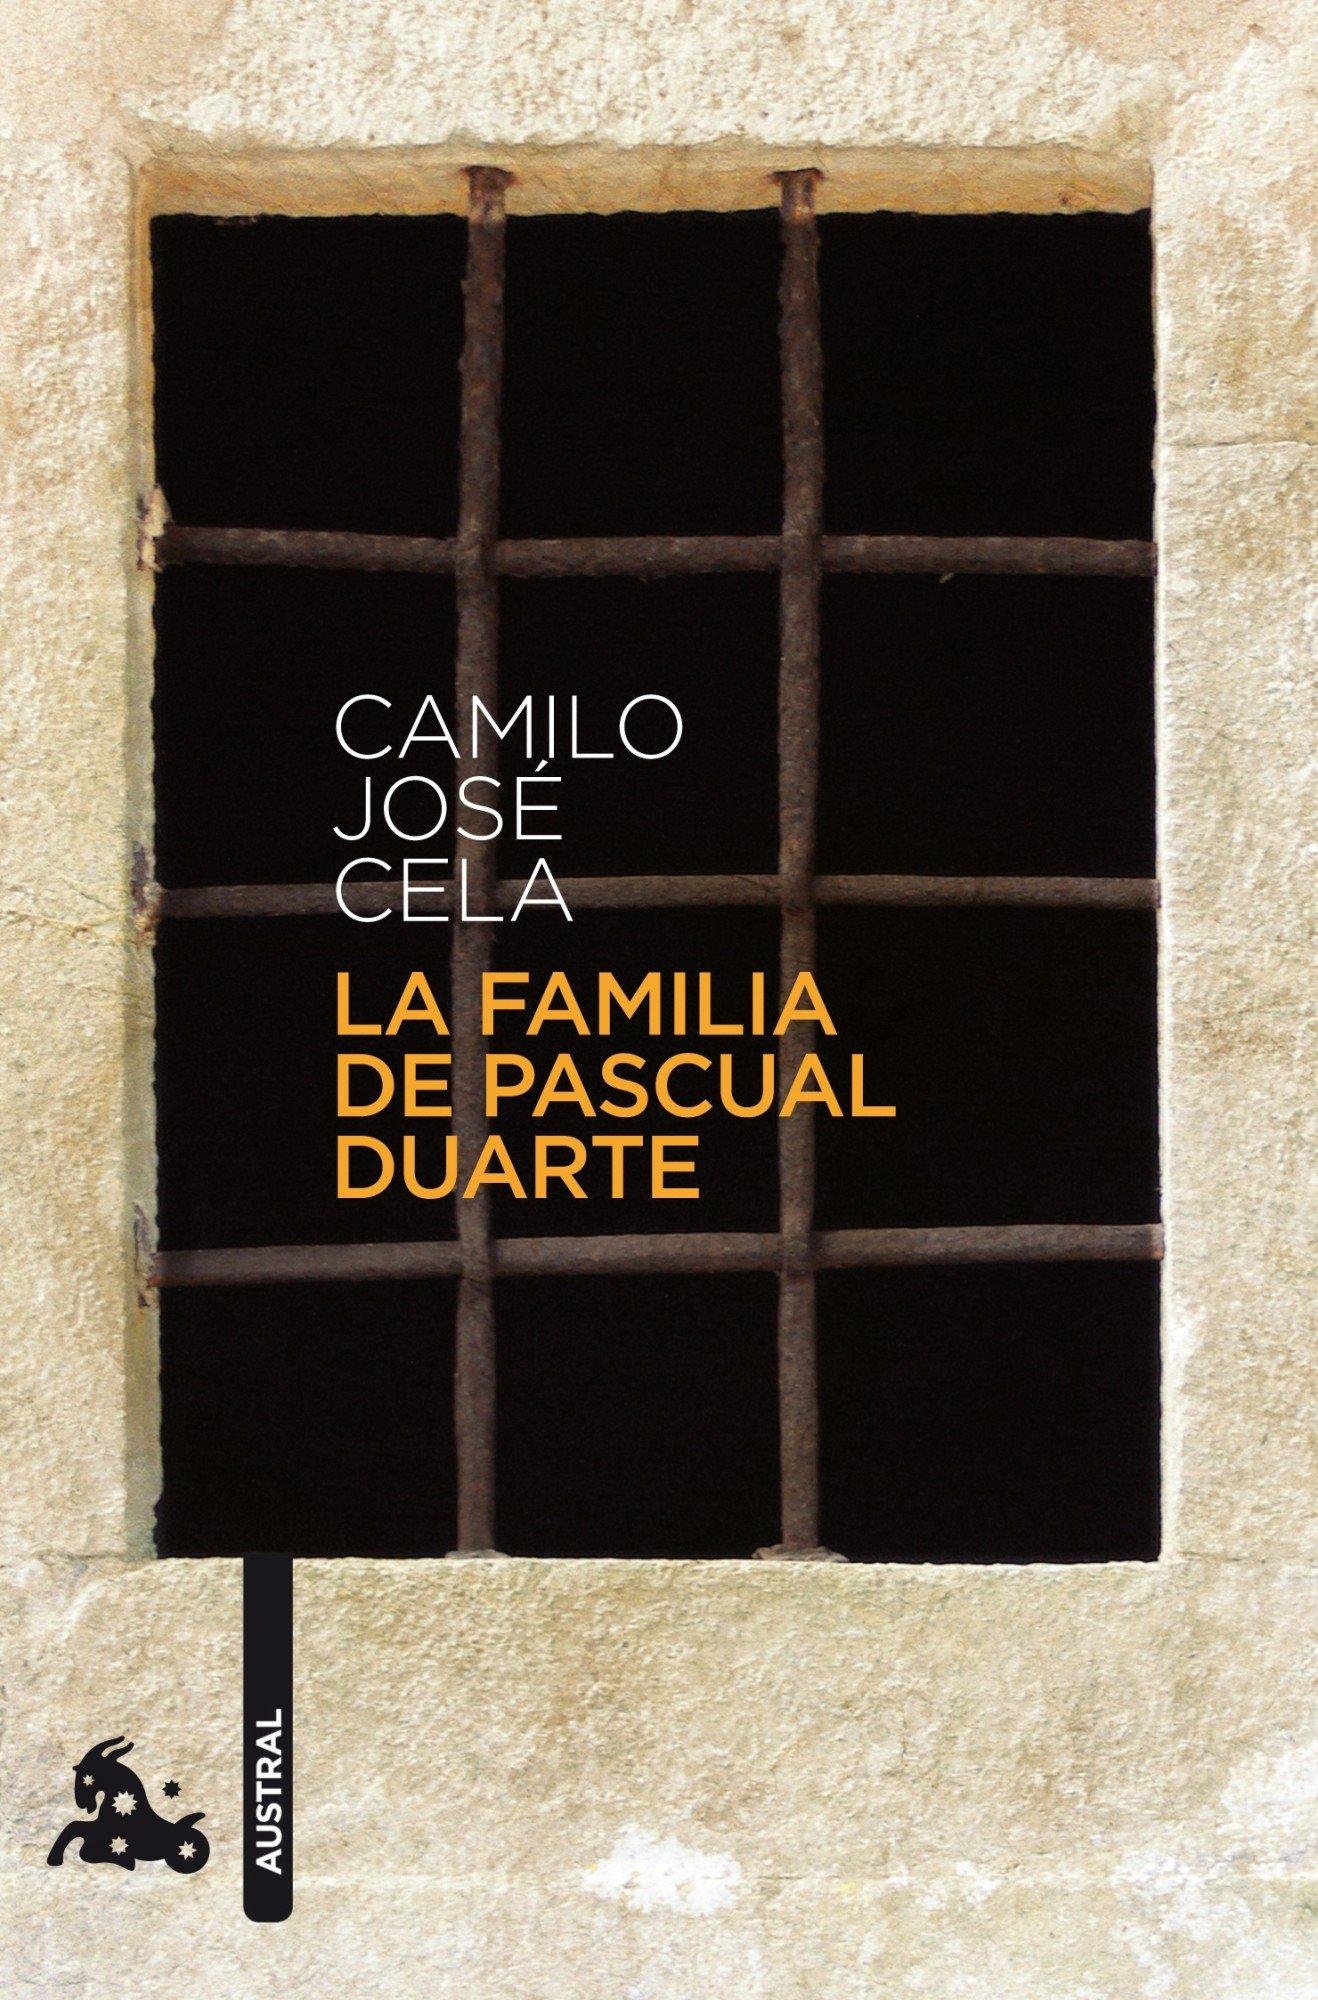 La familia de Pascual Duarte (Contemporánea) Tapa blanda – 6 jul 2010 Camilo José Cela Austral 8423342786 Spagnolo